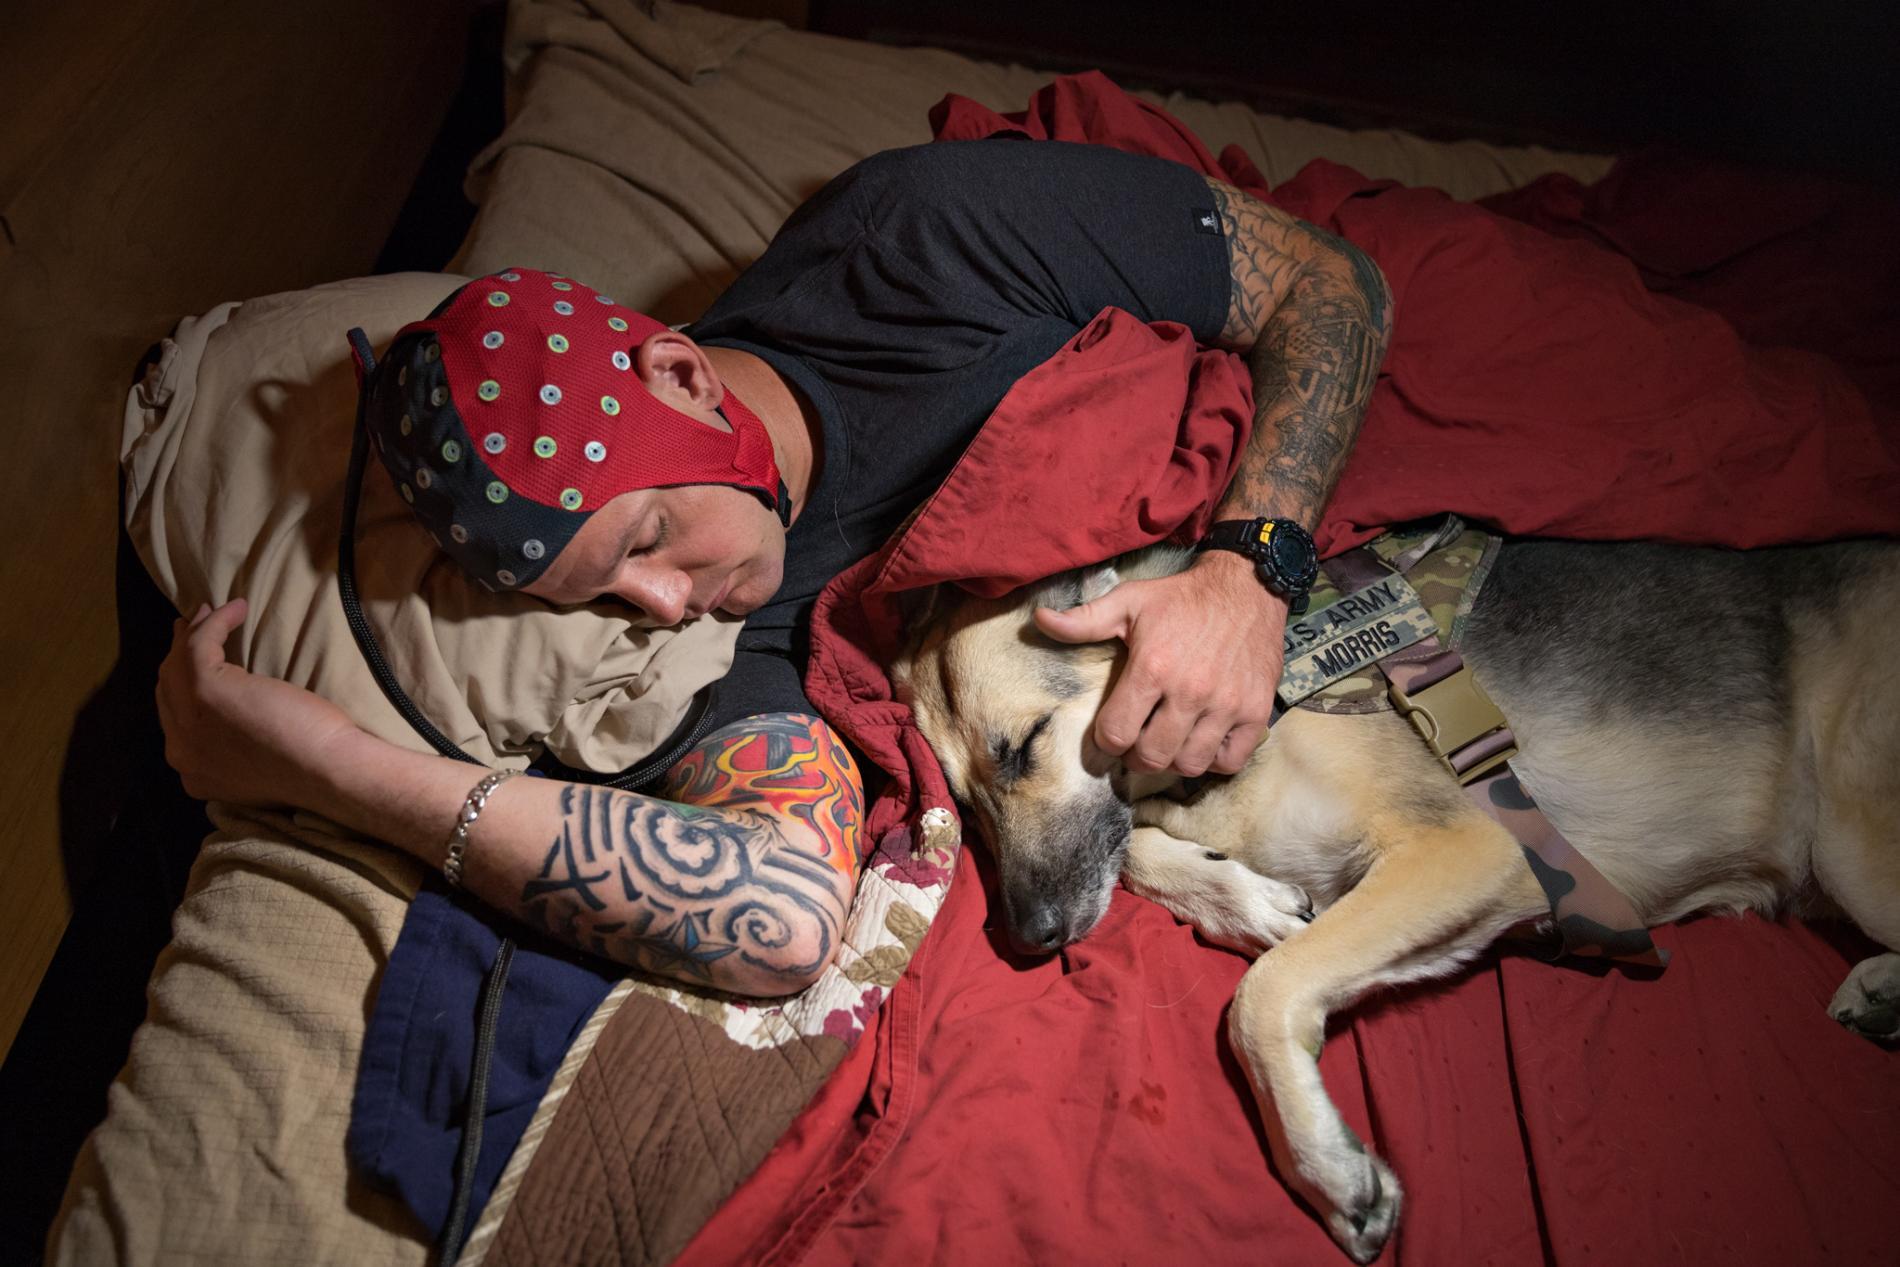 sleep-study-dog-ptsd-veteran-companionship.adapt.1900.1